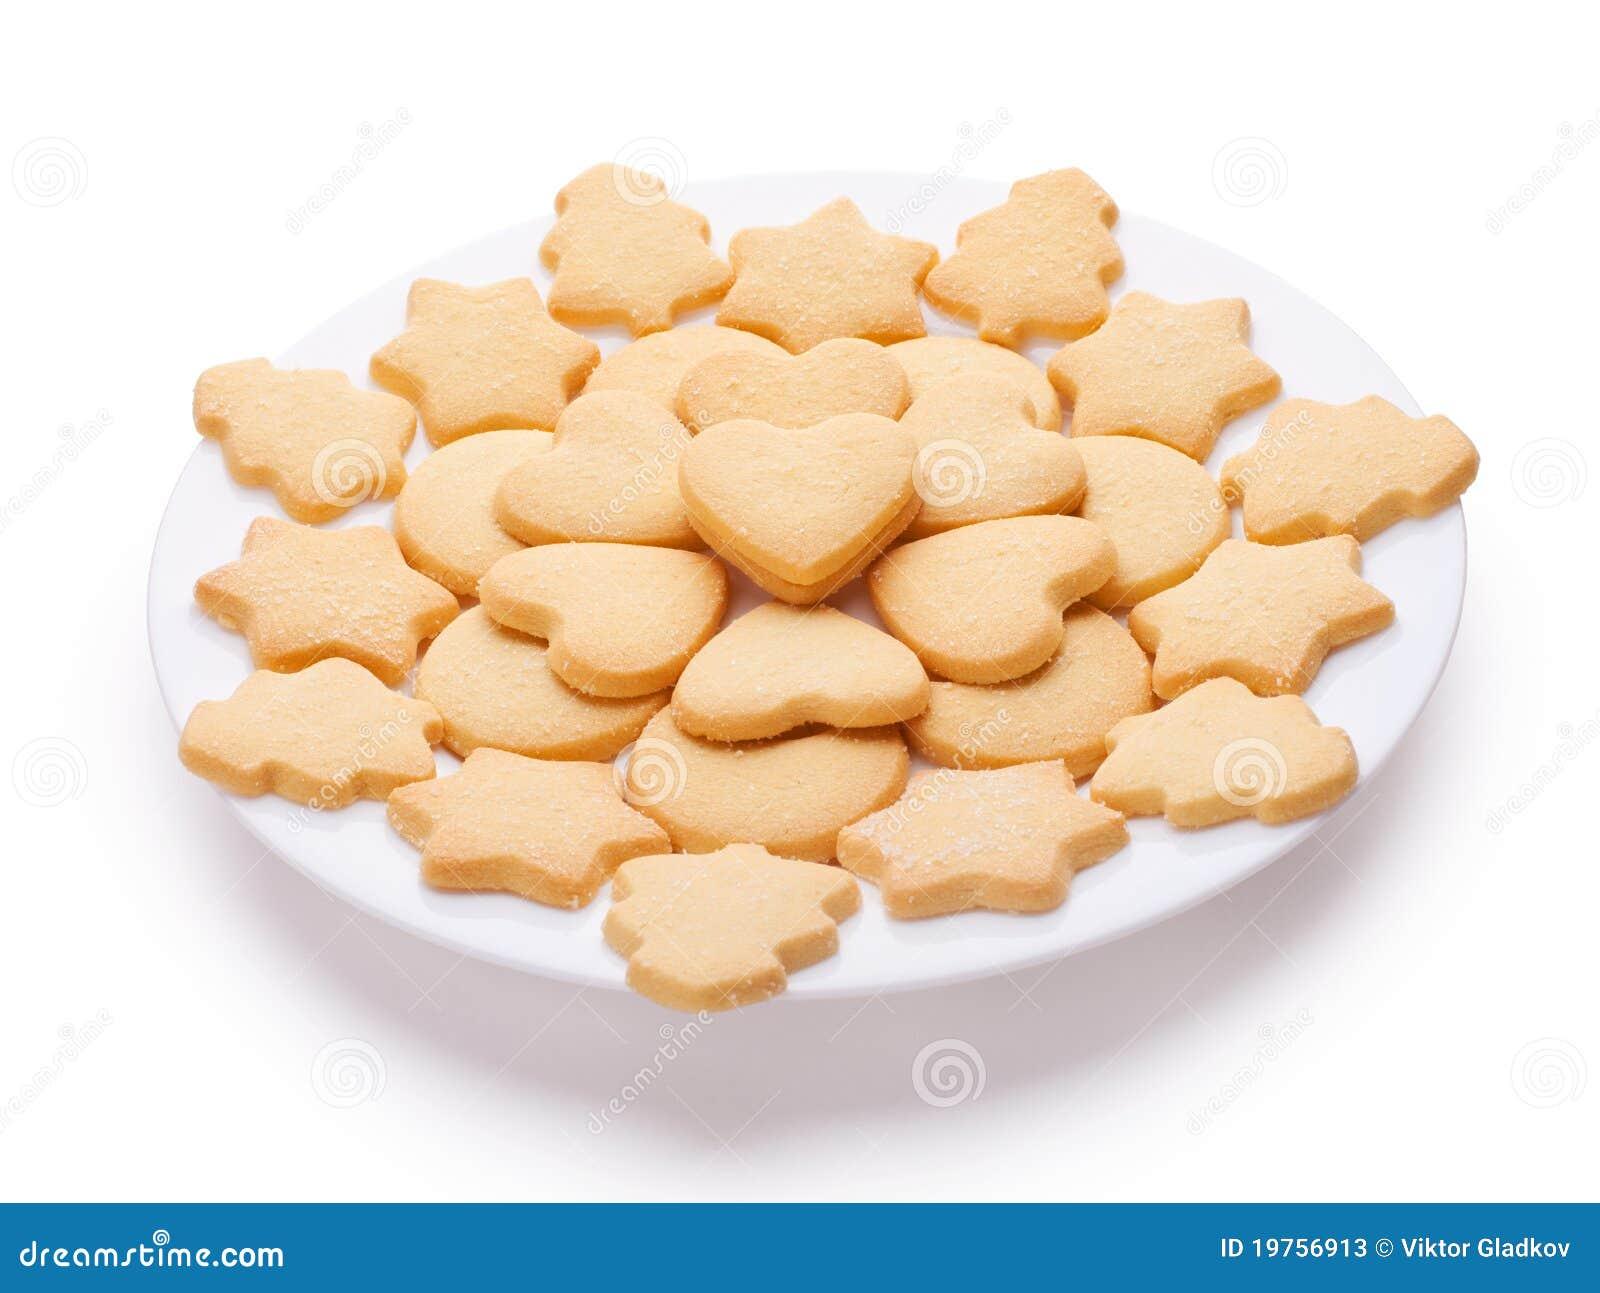 Resultado de imagen de biscuits shapes